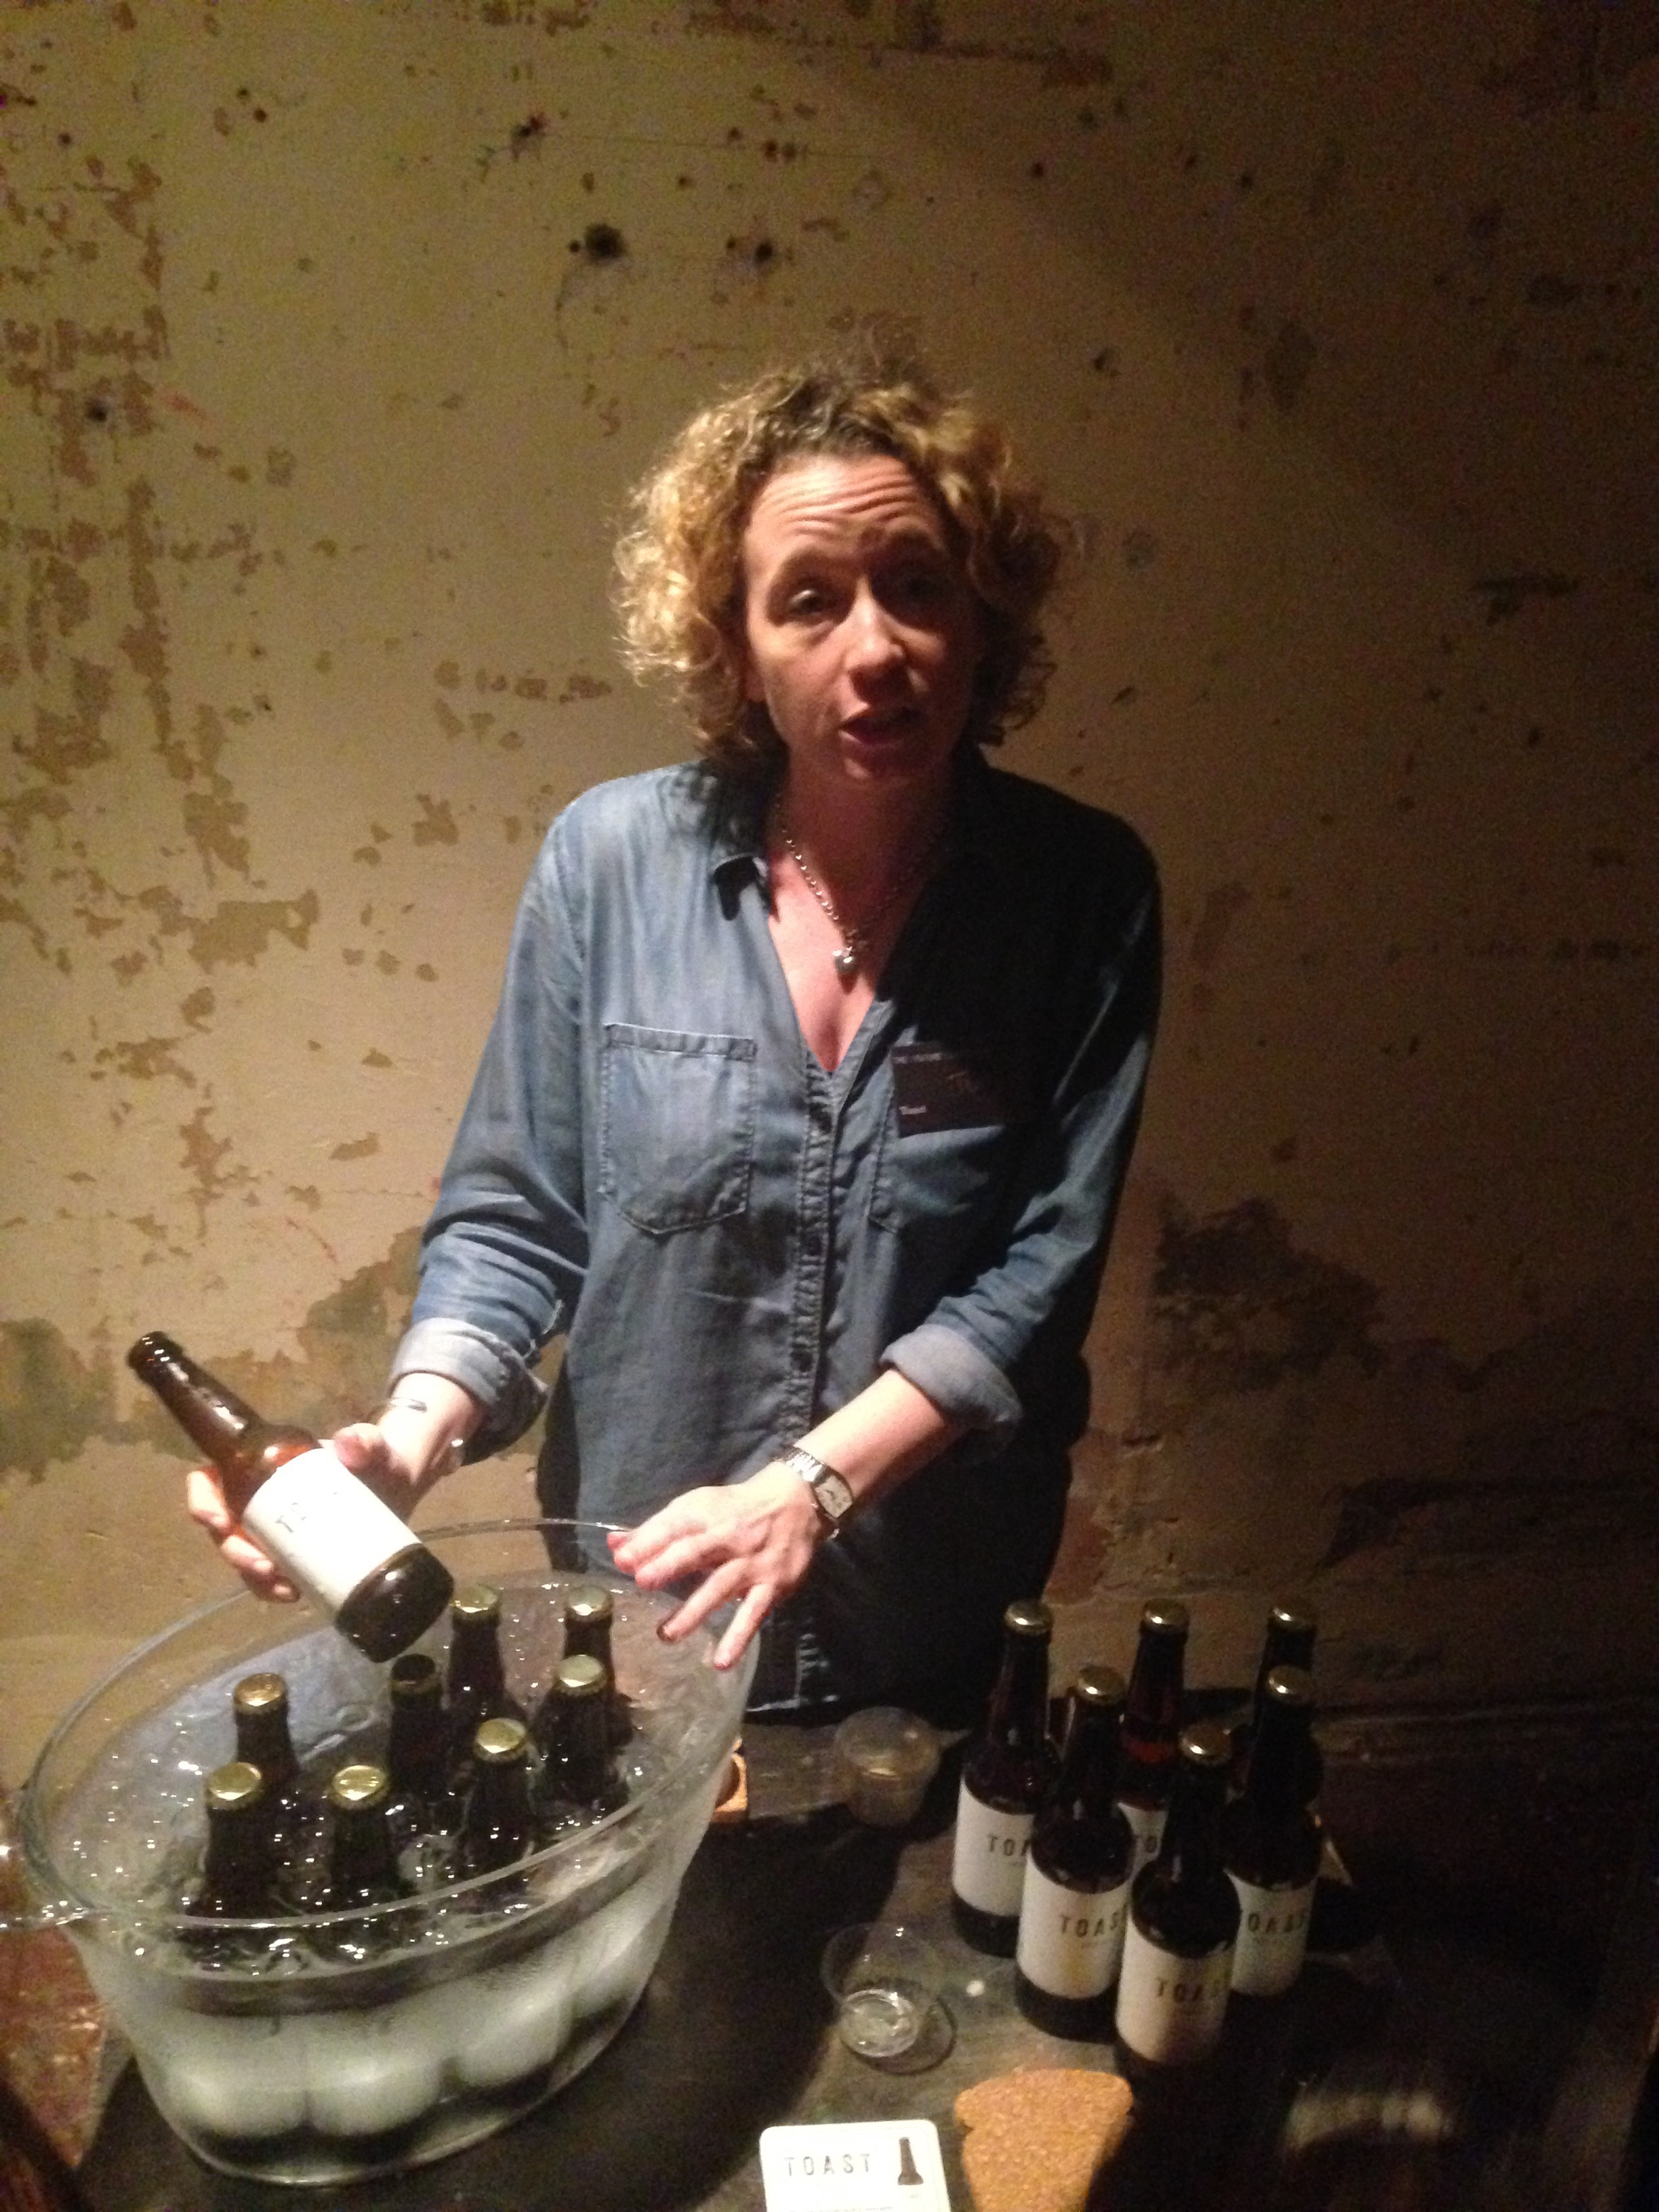 Toast Ale beer_thesquidstories blog 4